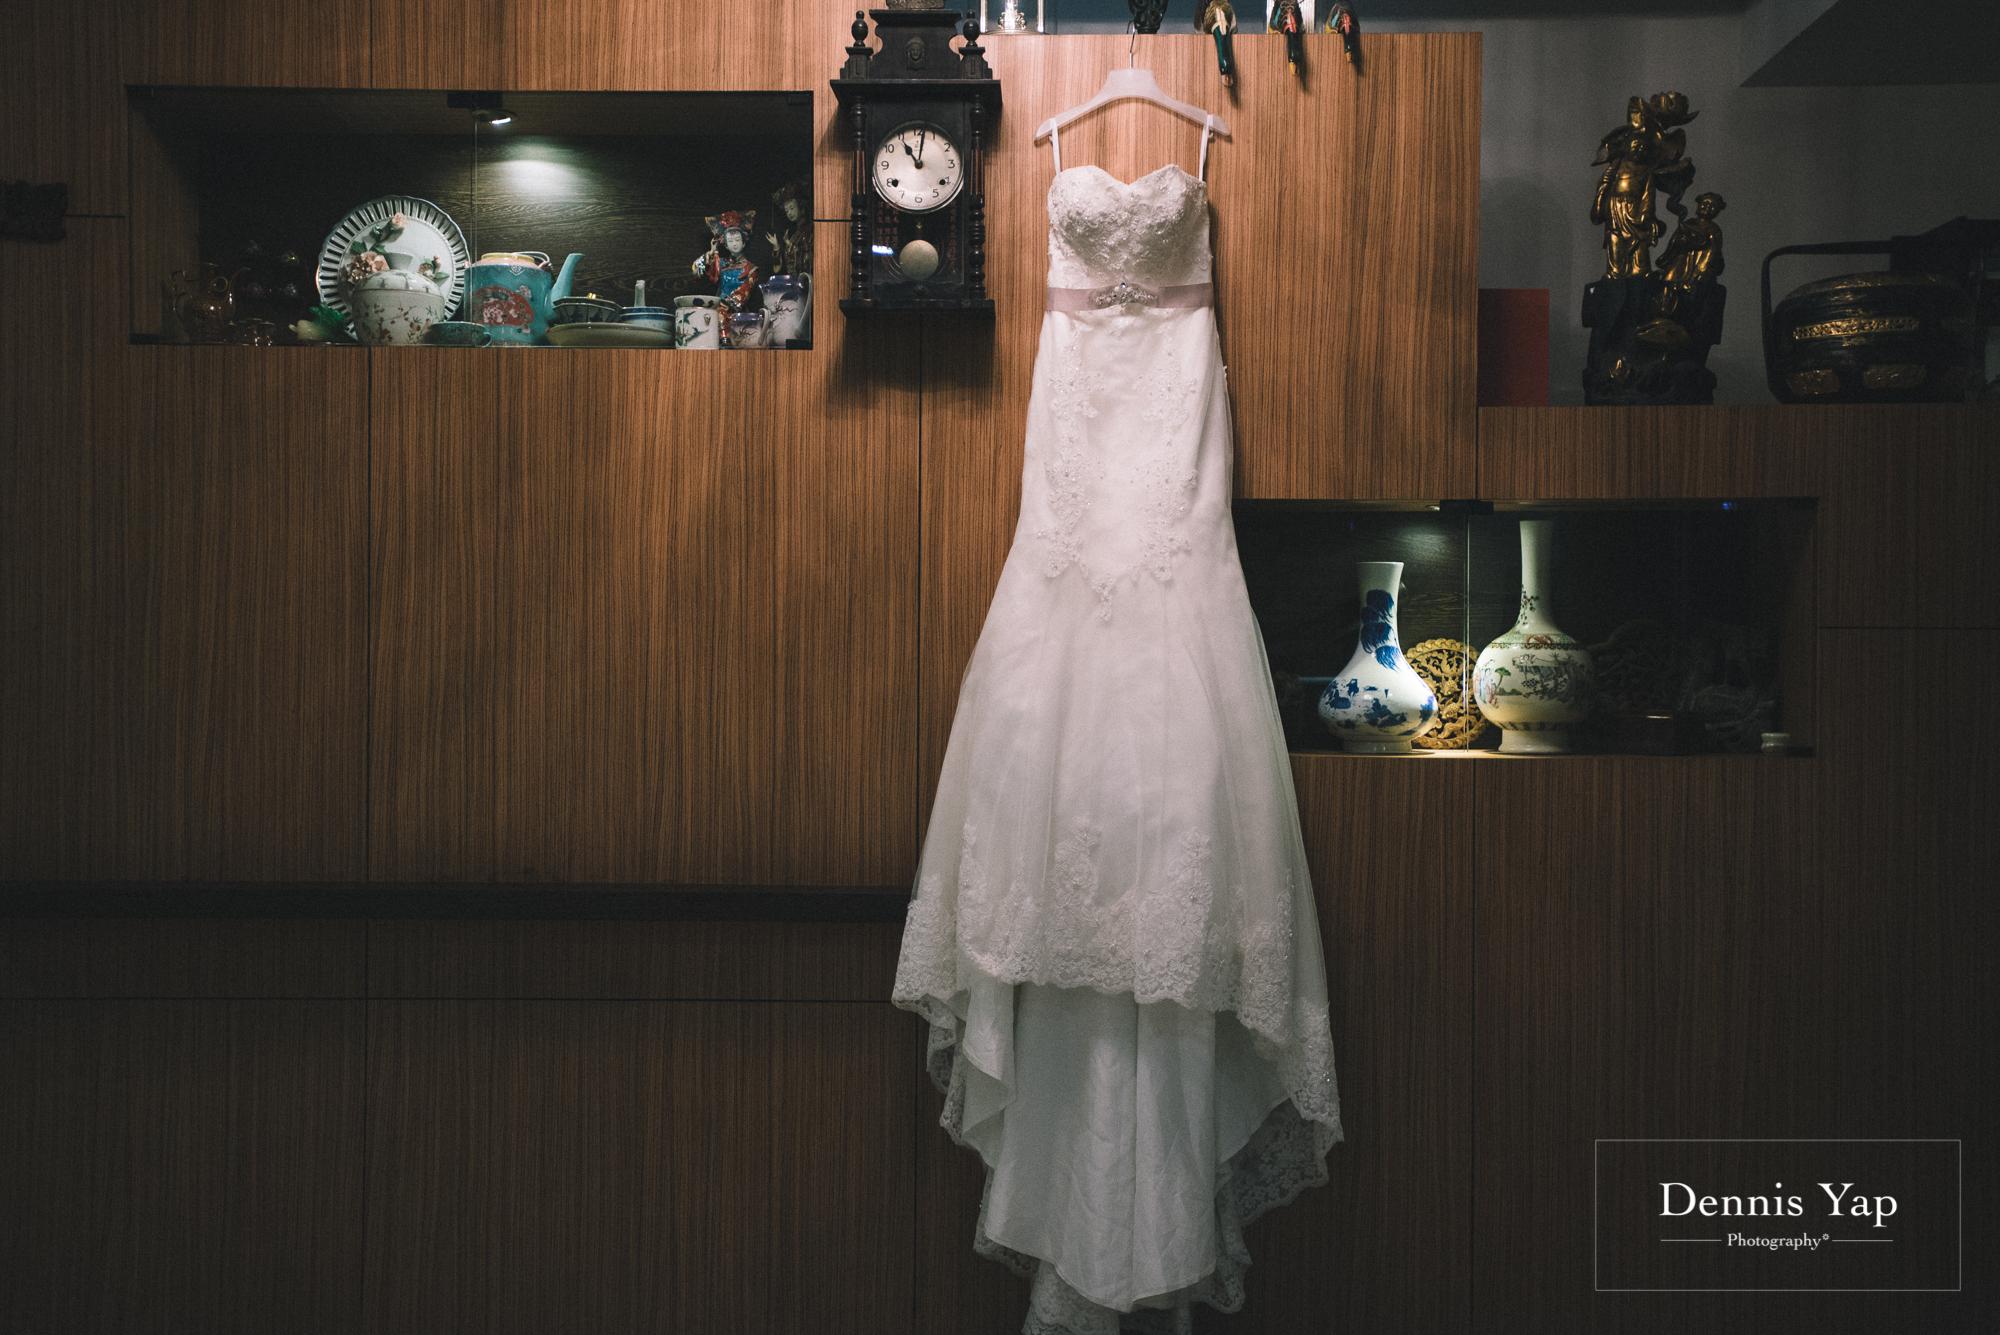 chin foo sze yin wedding day botanic klang club house dennis yap photography-2.jpg